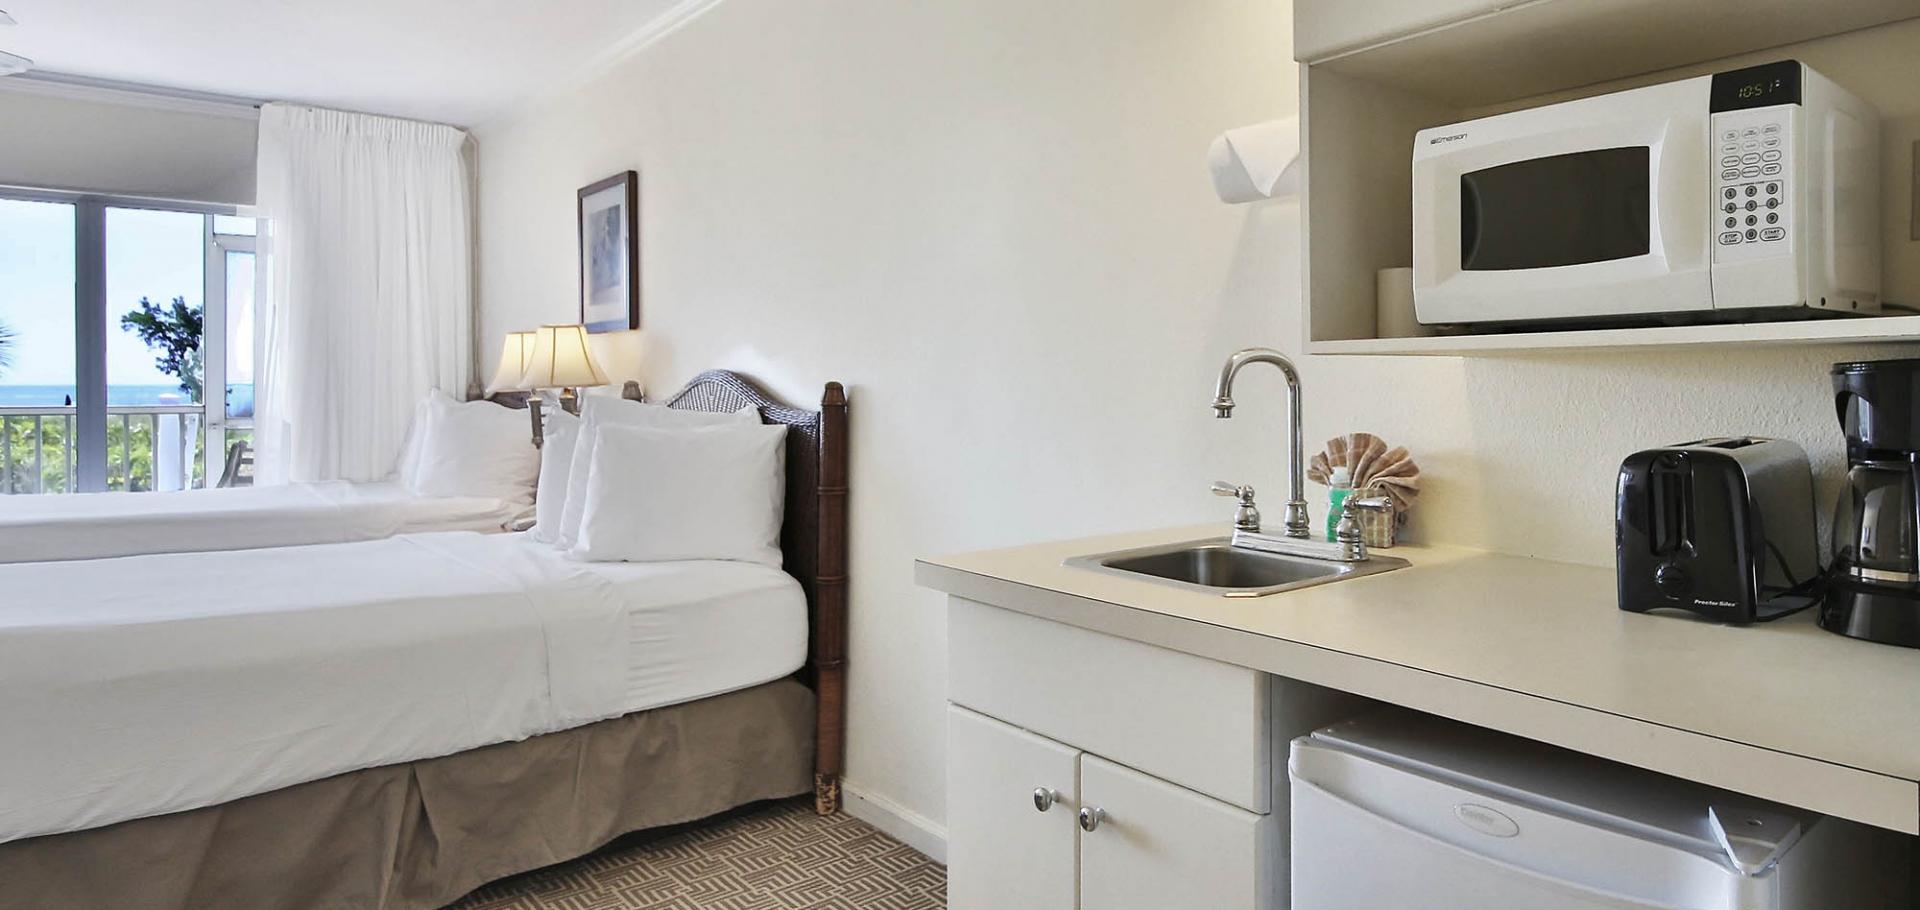 Sanibel Seaside Inn kitchenette and bedroom